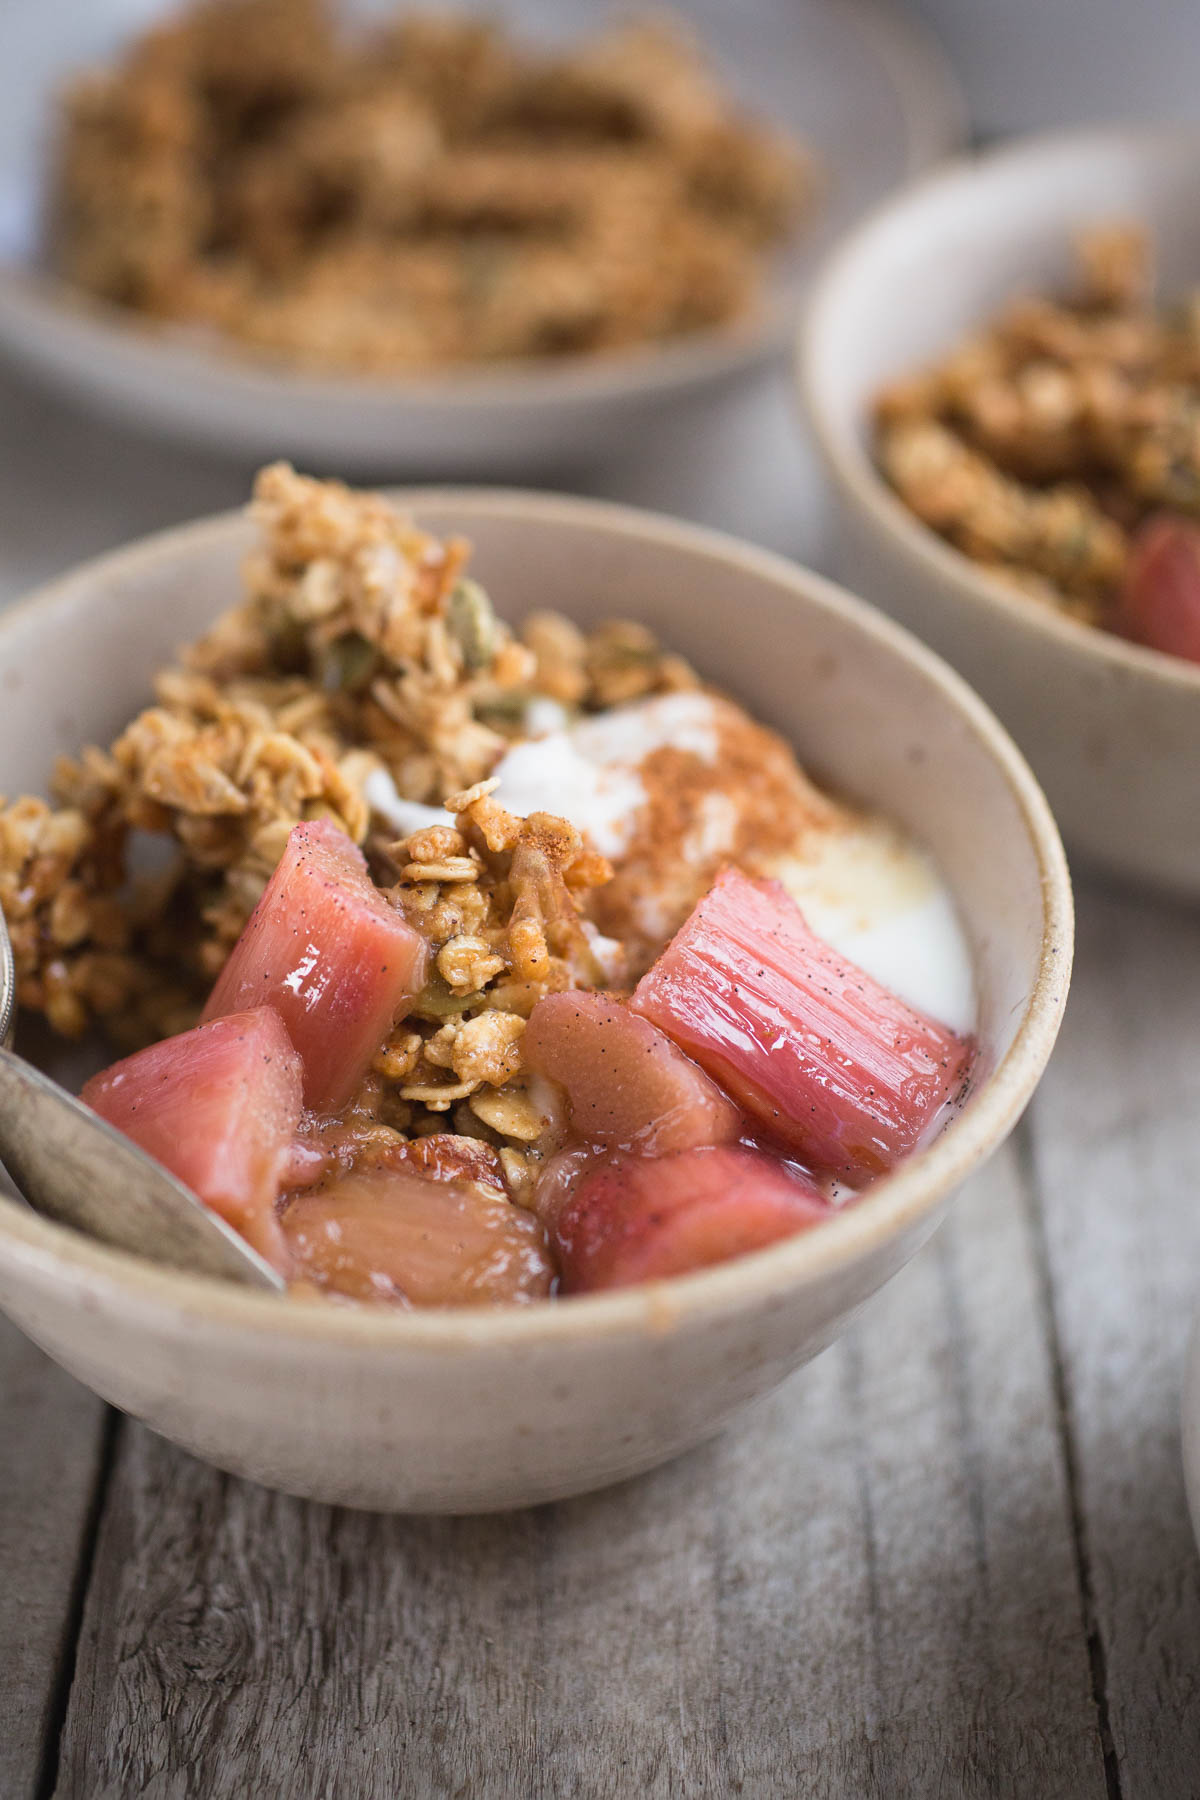 Clumpy Granola Bowl with Stewed Rhubarb and Yogurt